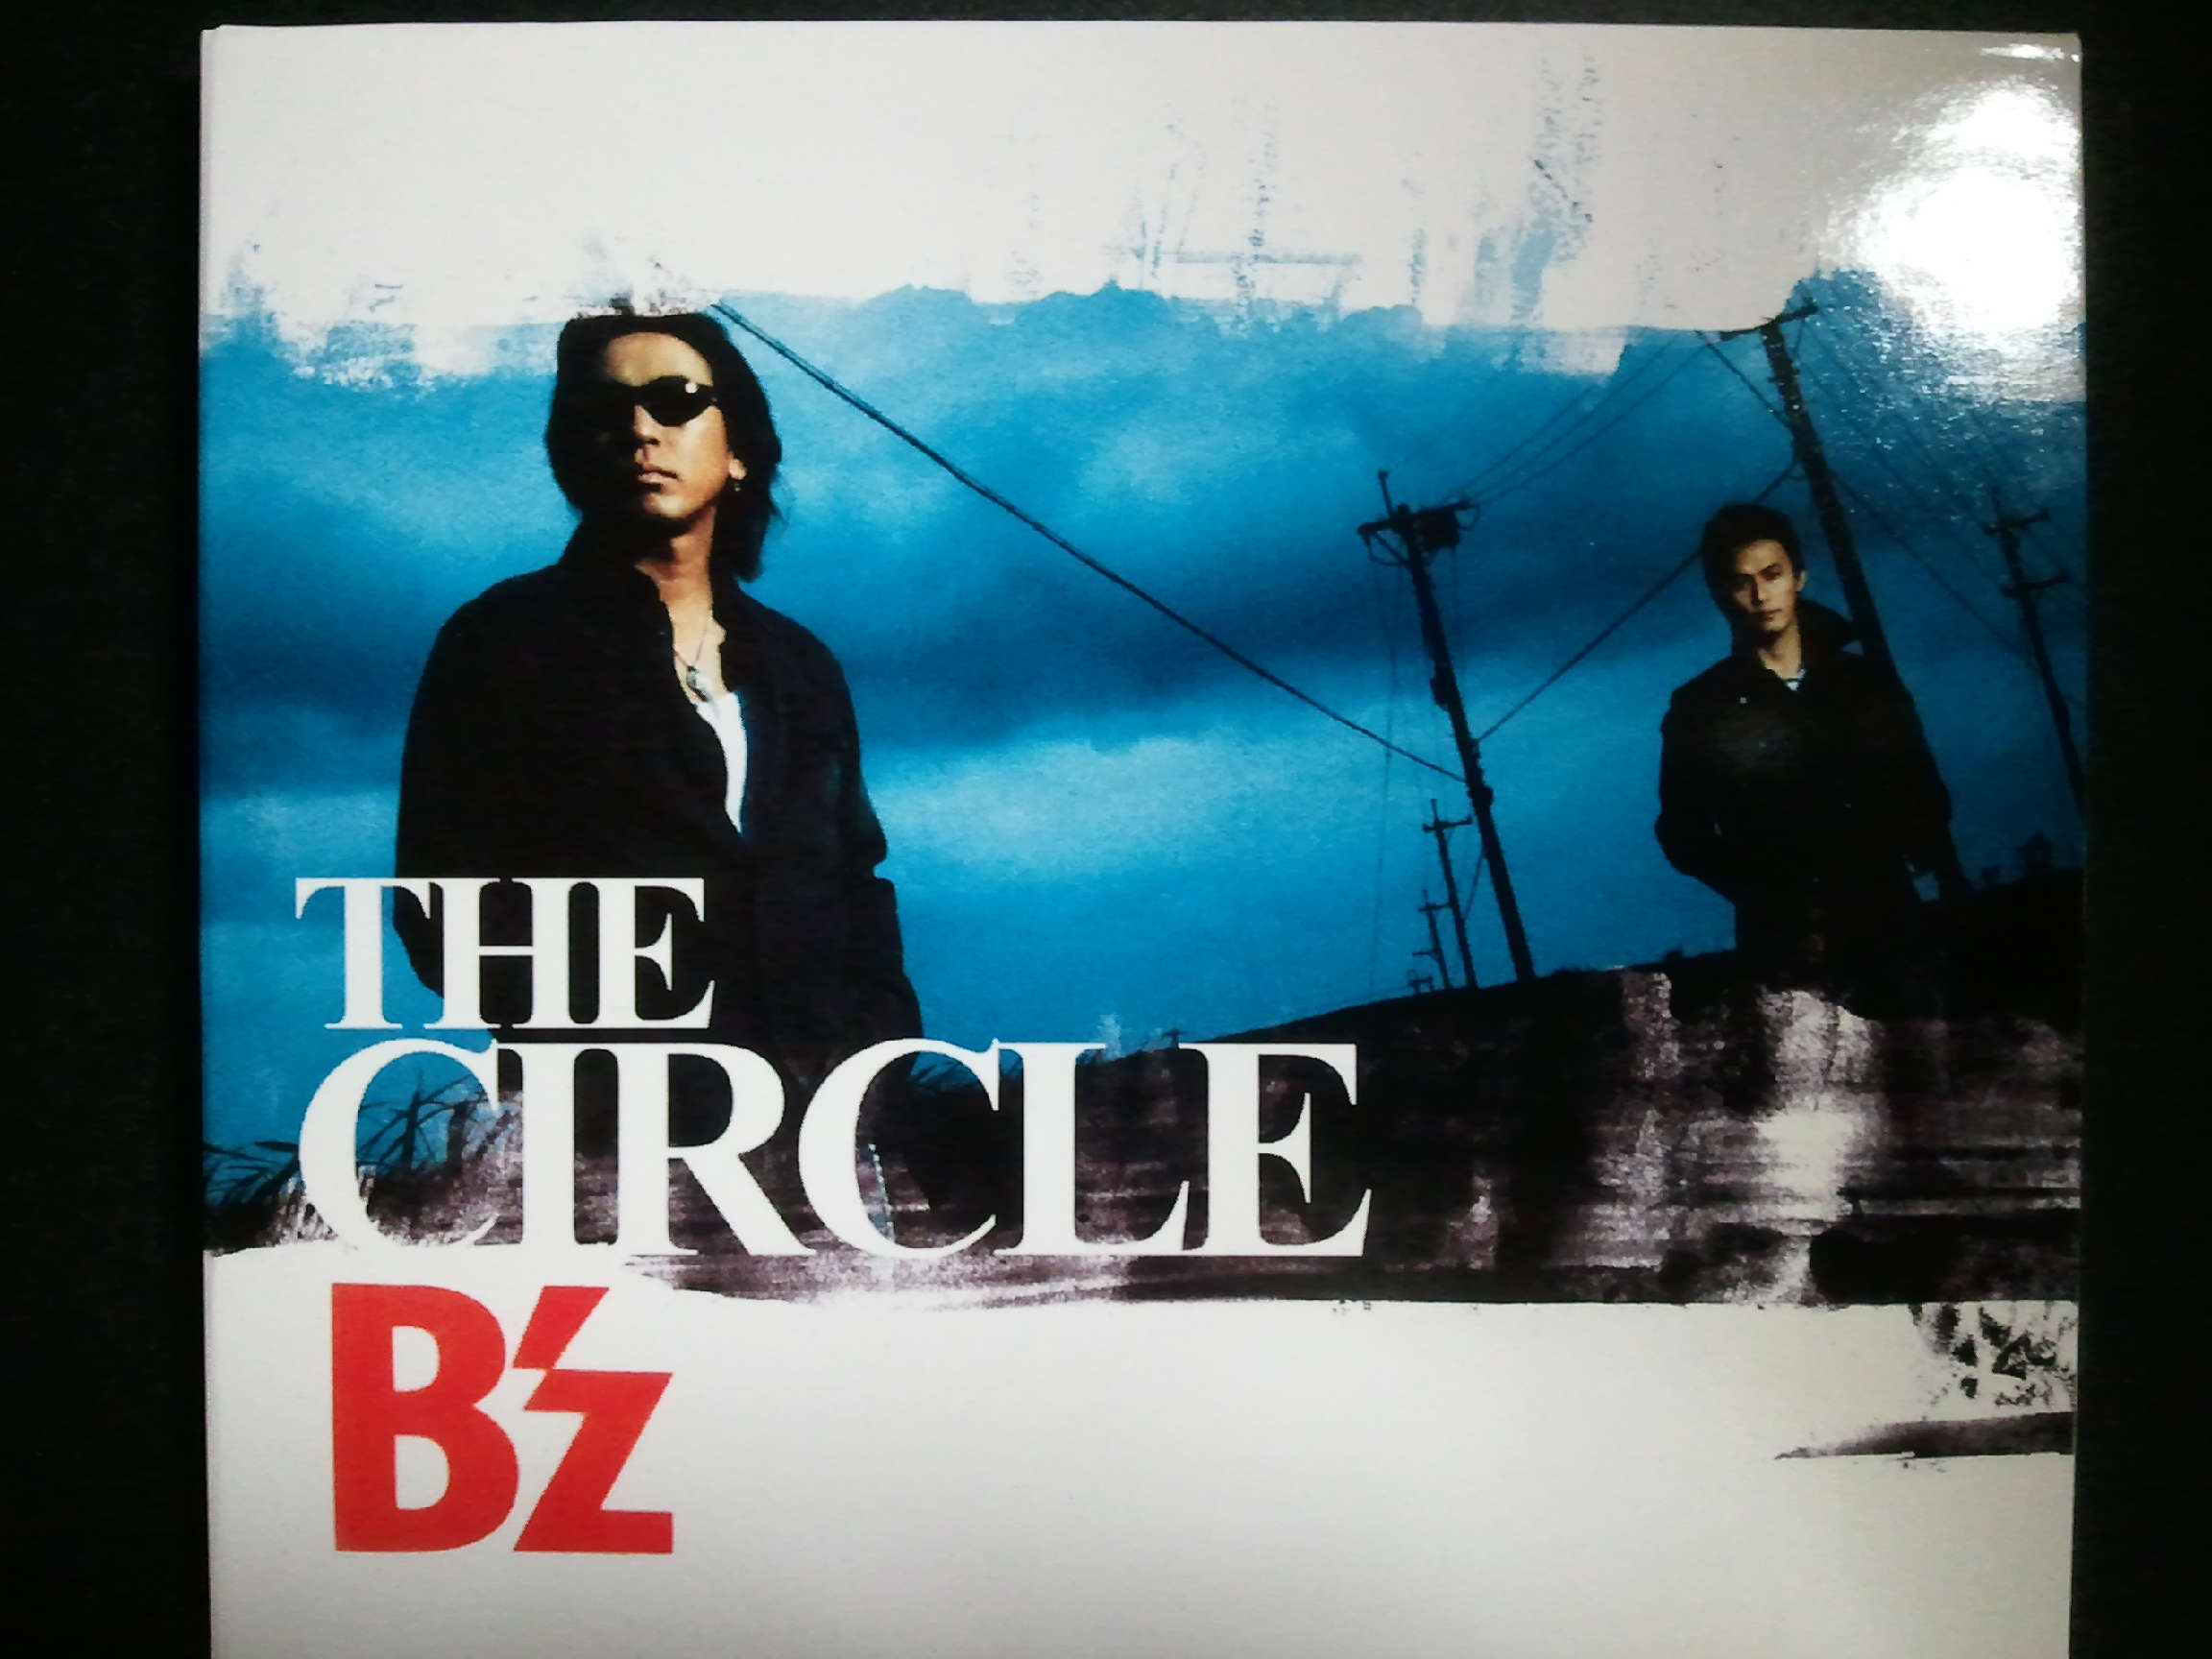 B'z The Circle